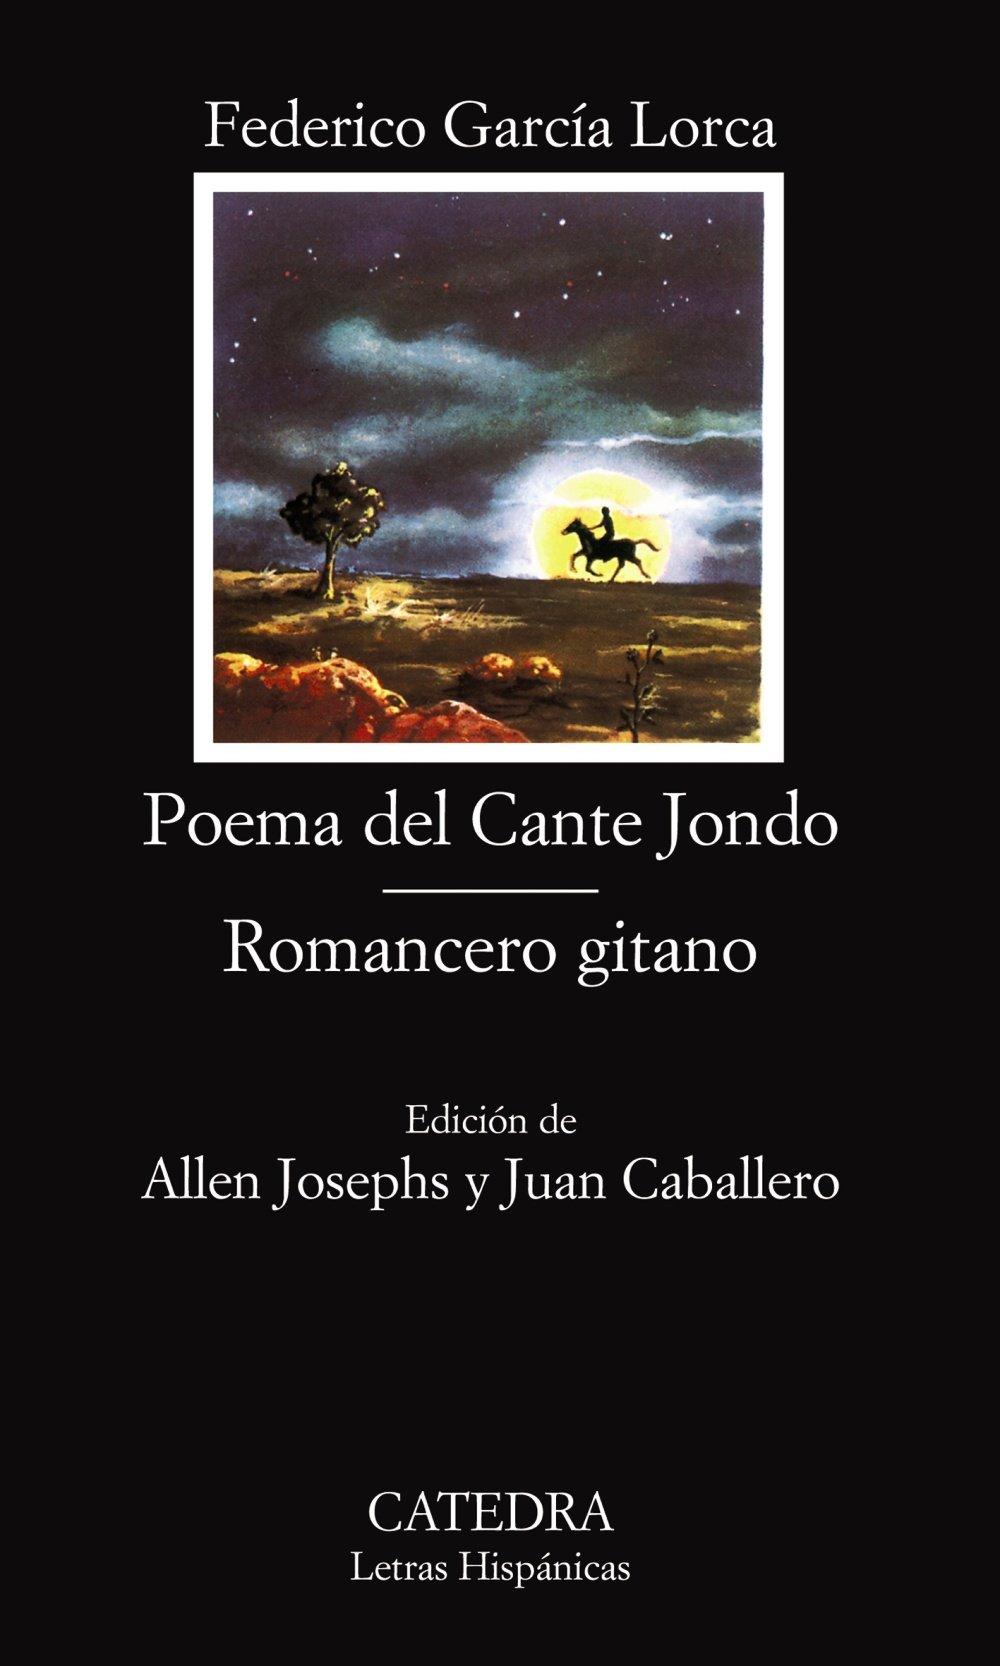 Poema Del Cante Jondo / Romancero Gitano (Letras Hispanicas) (Spanish Edition): Federico Garcia Lorca, Allen Josephs, Juan Caballero, Mauro Caceres: ...